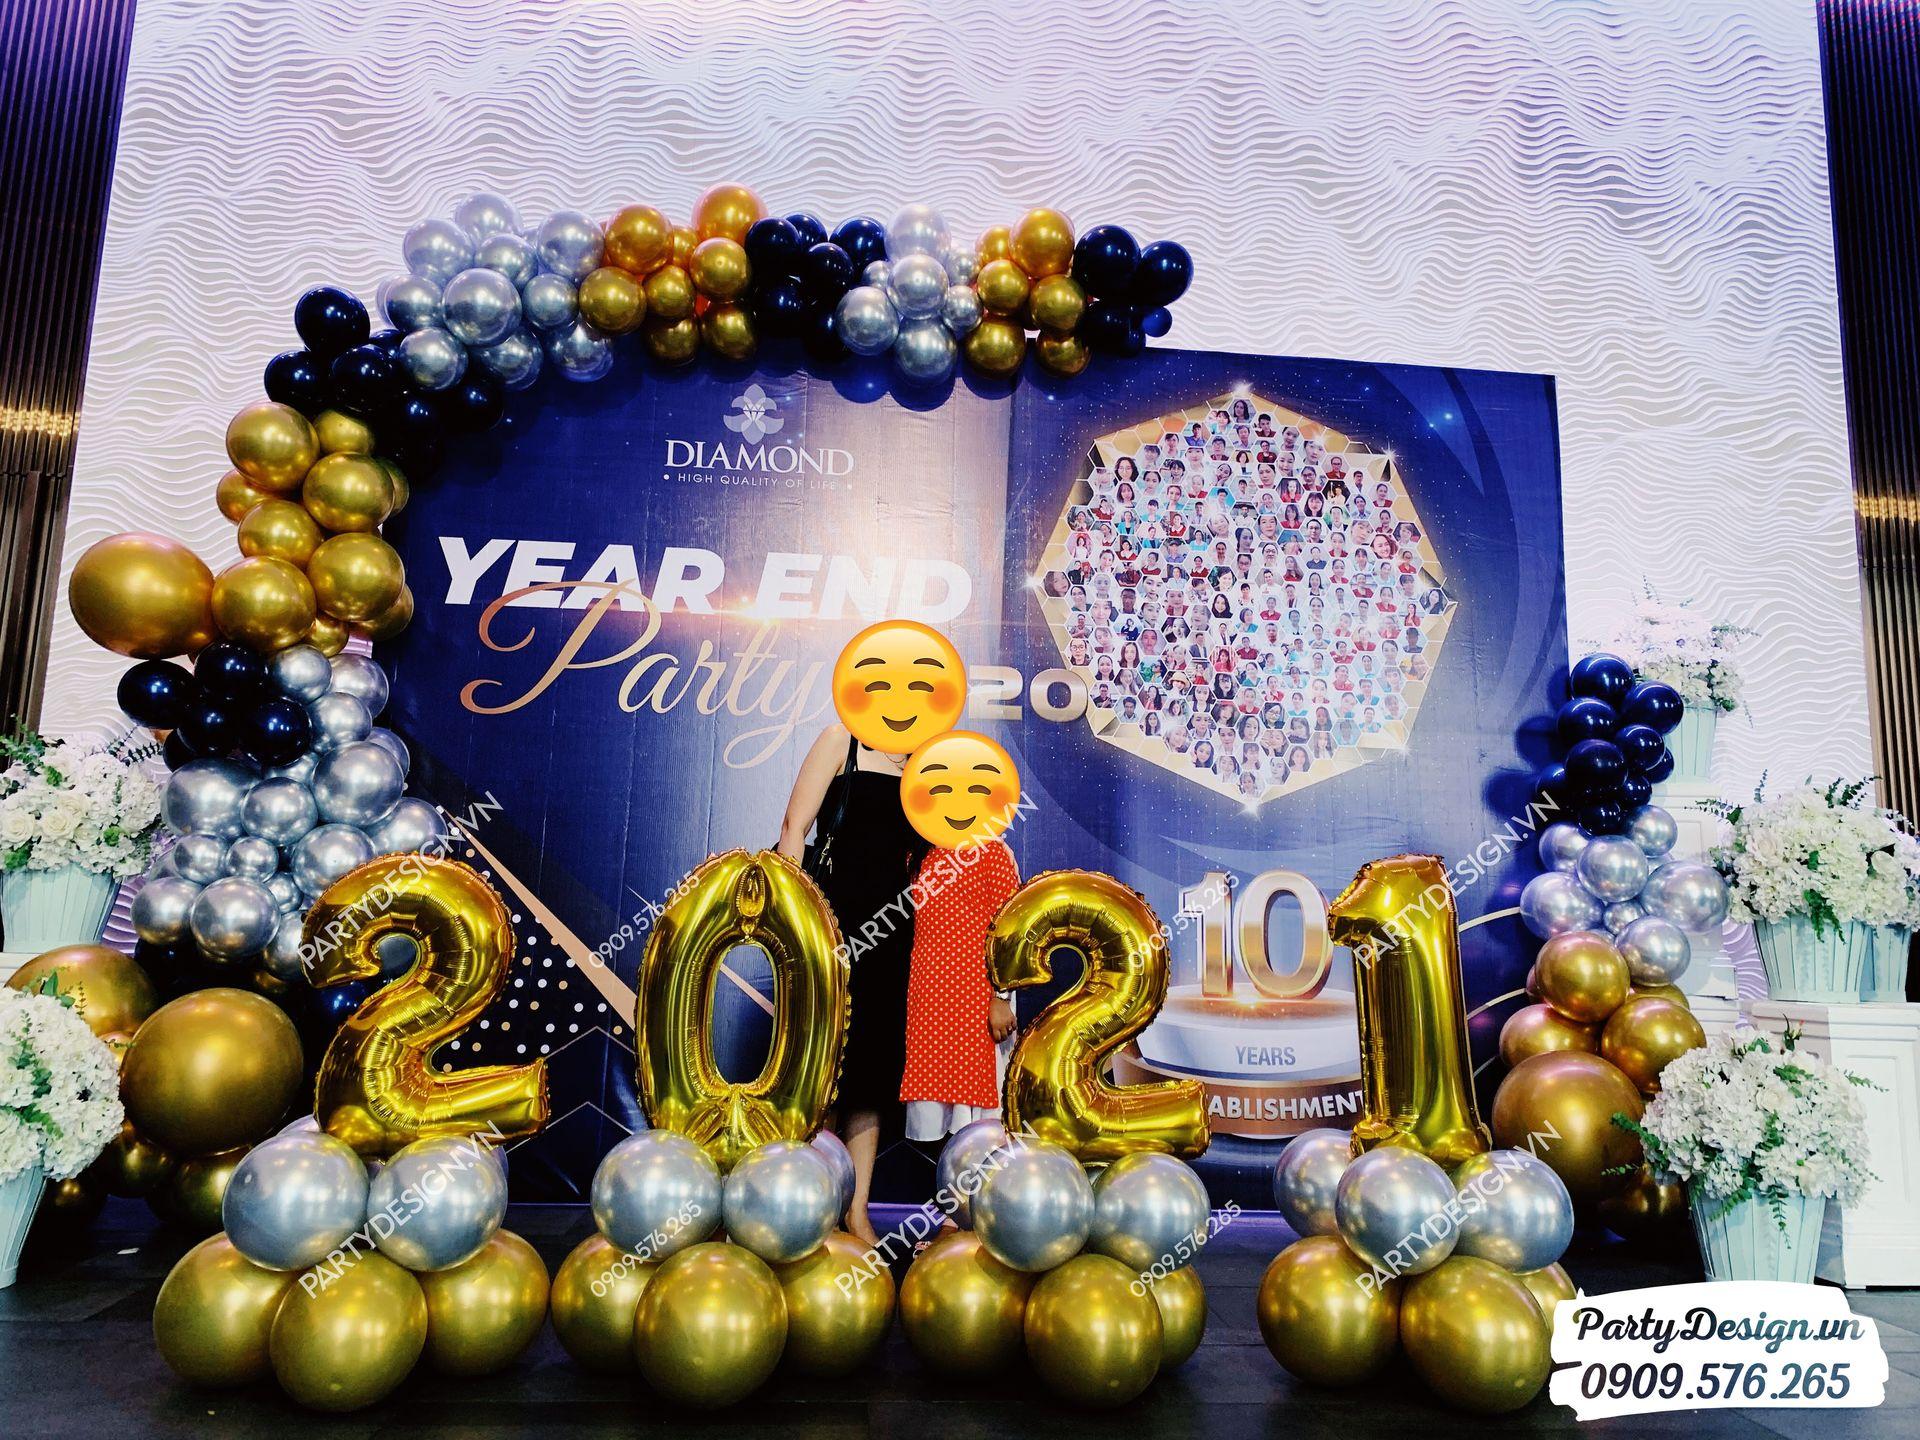 Backdrop trang trí tiệc Year End Party, tất niên Diamond